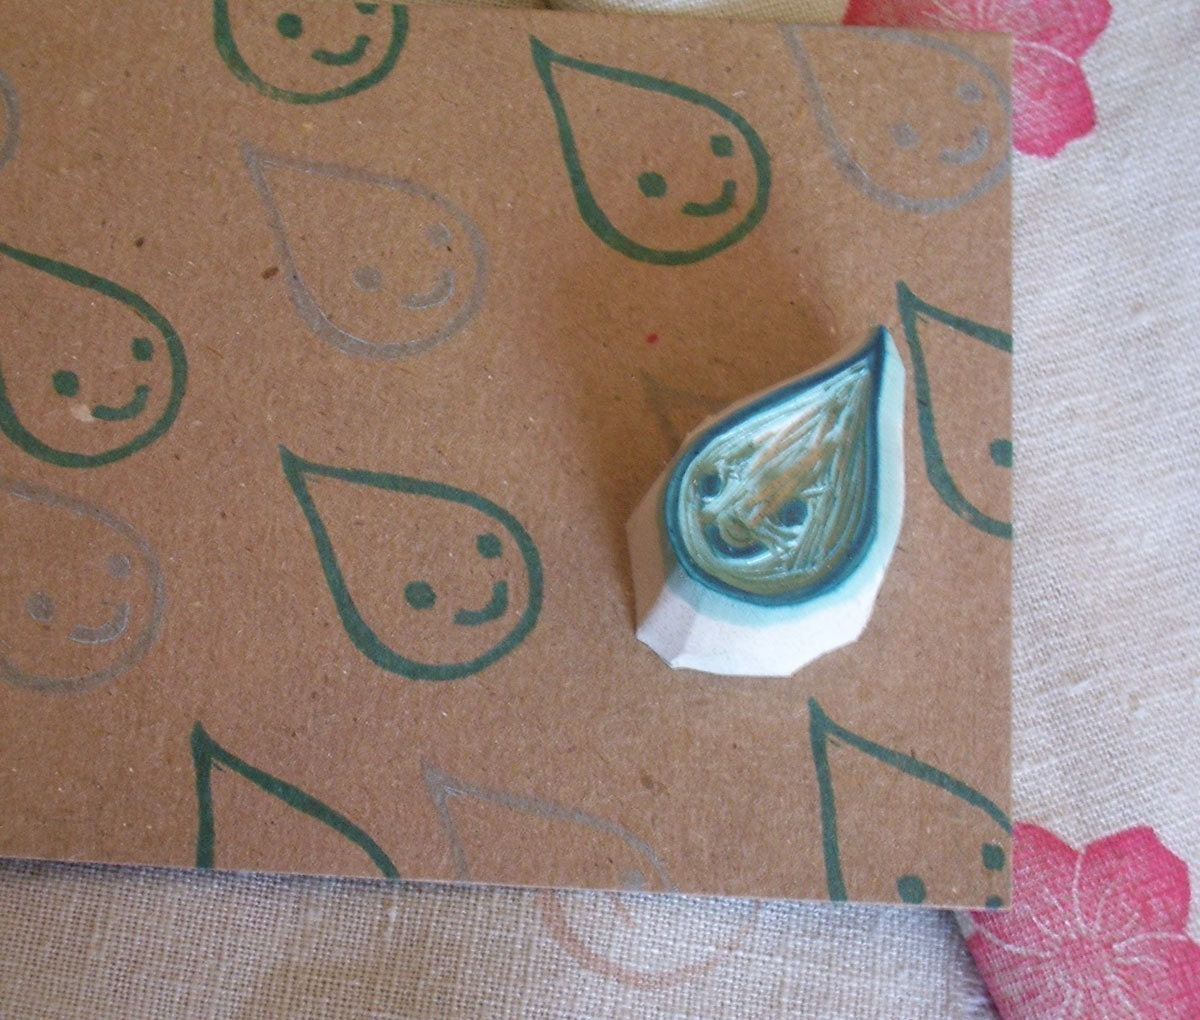 Glop-the Chubbiest little Rain Drop - Rubber Stamp